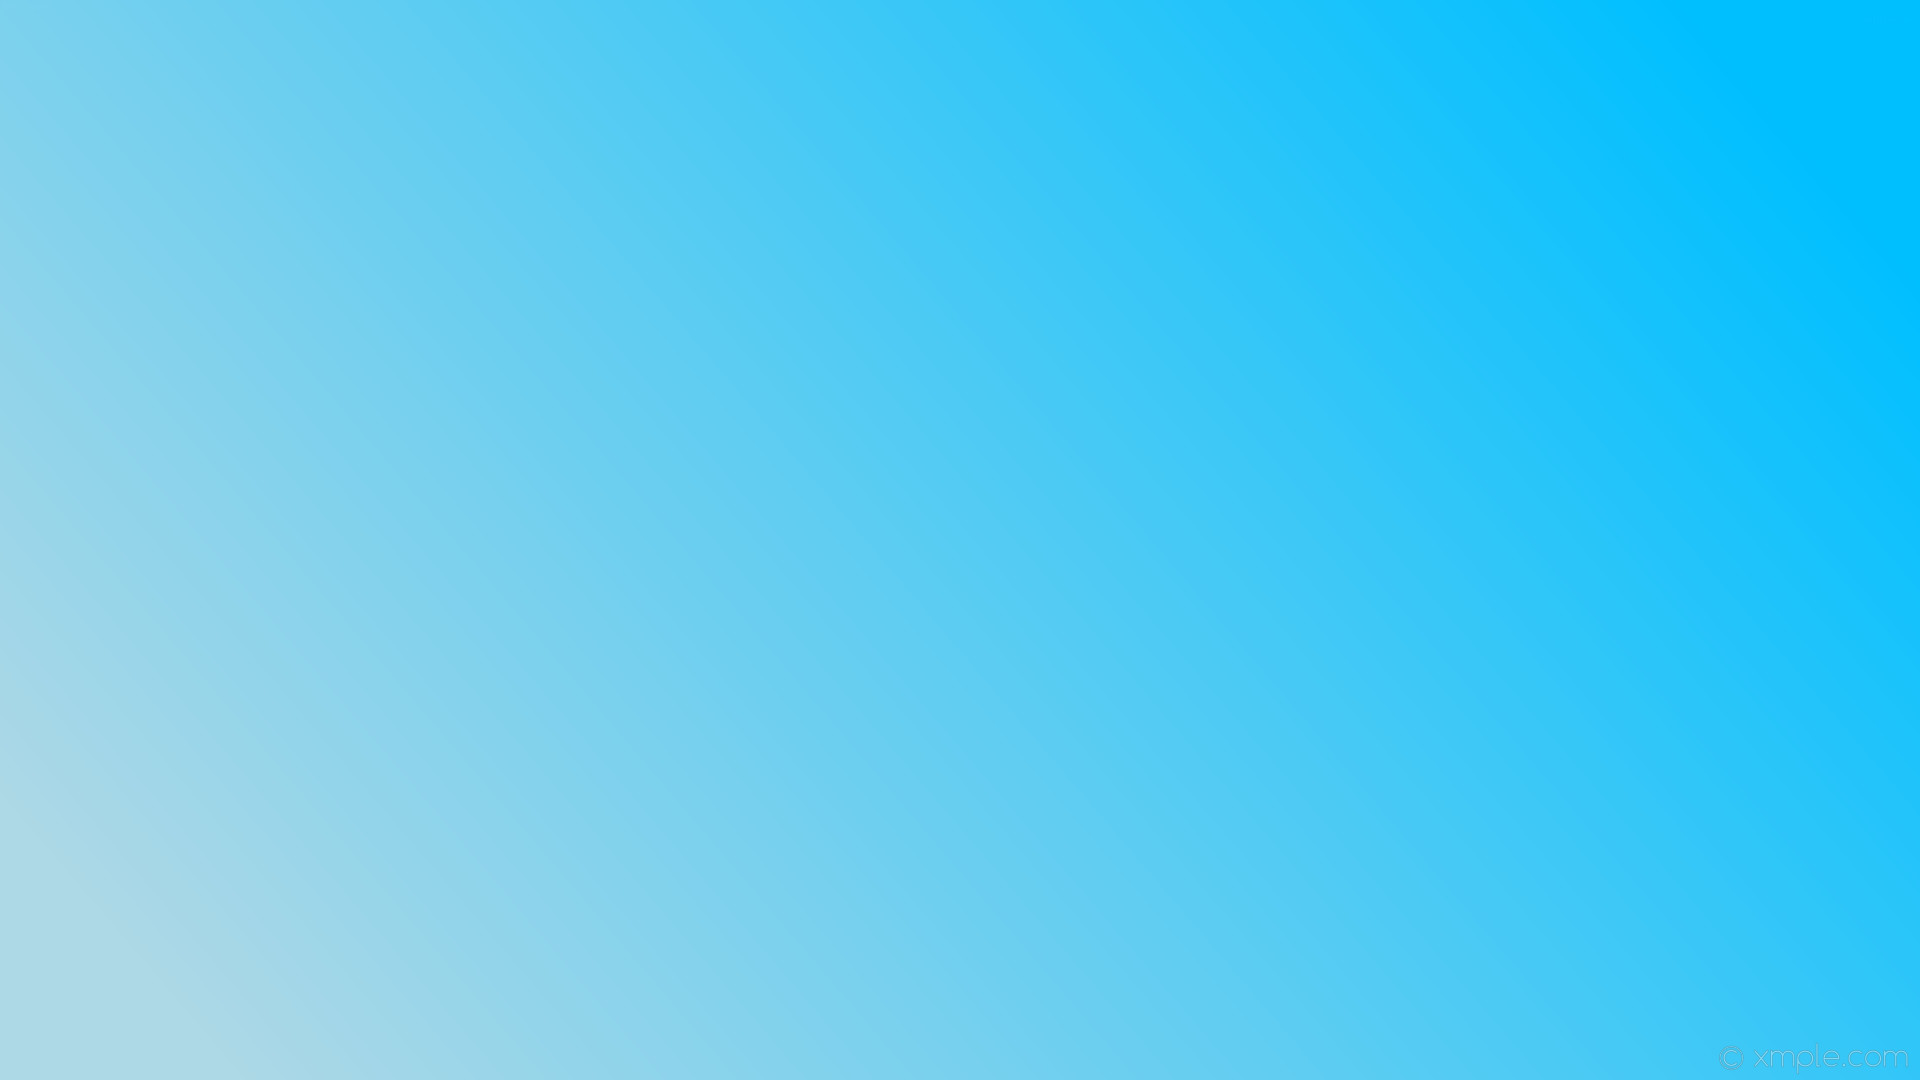 wallpaper linear blue gradient light blue deep sky blue #add8e6 #00bfff 195°